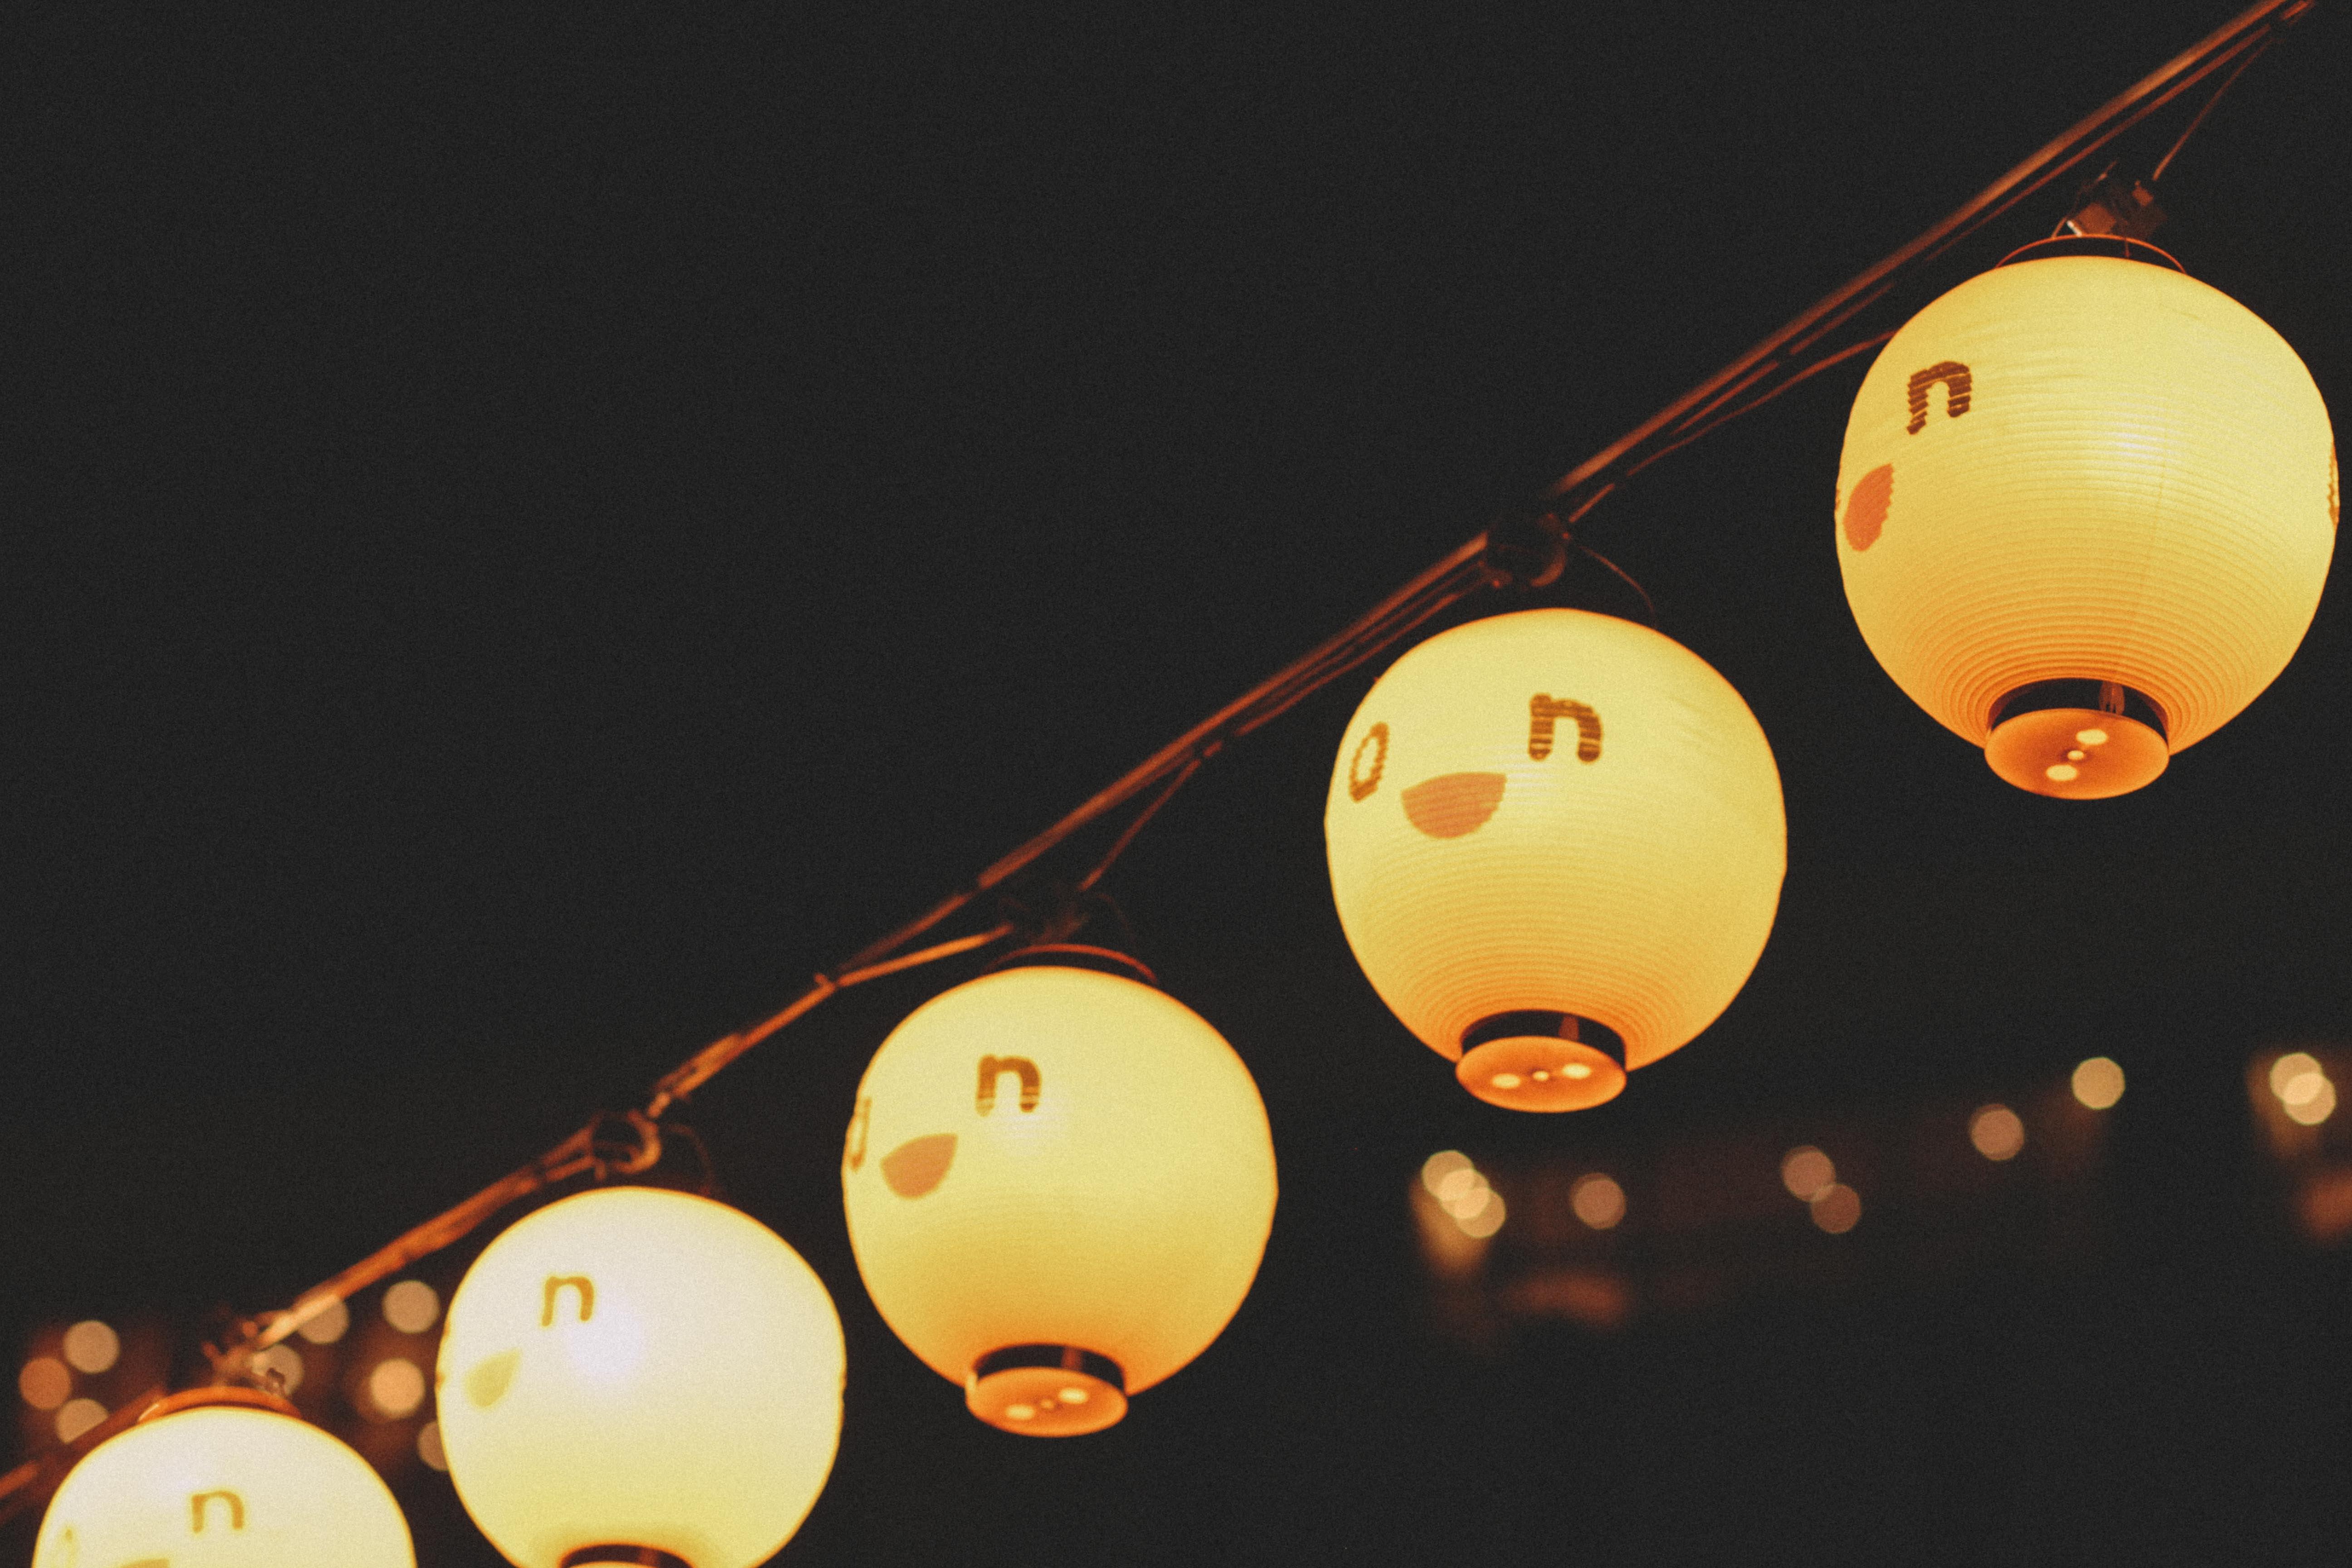 yellow lantern turned on at nighttime